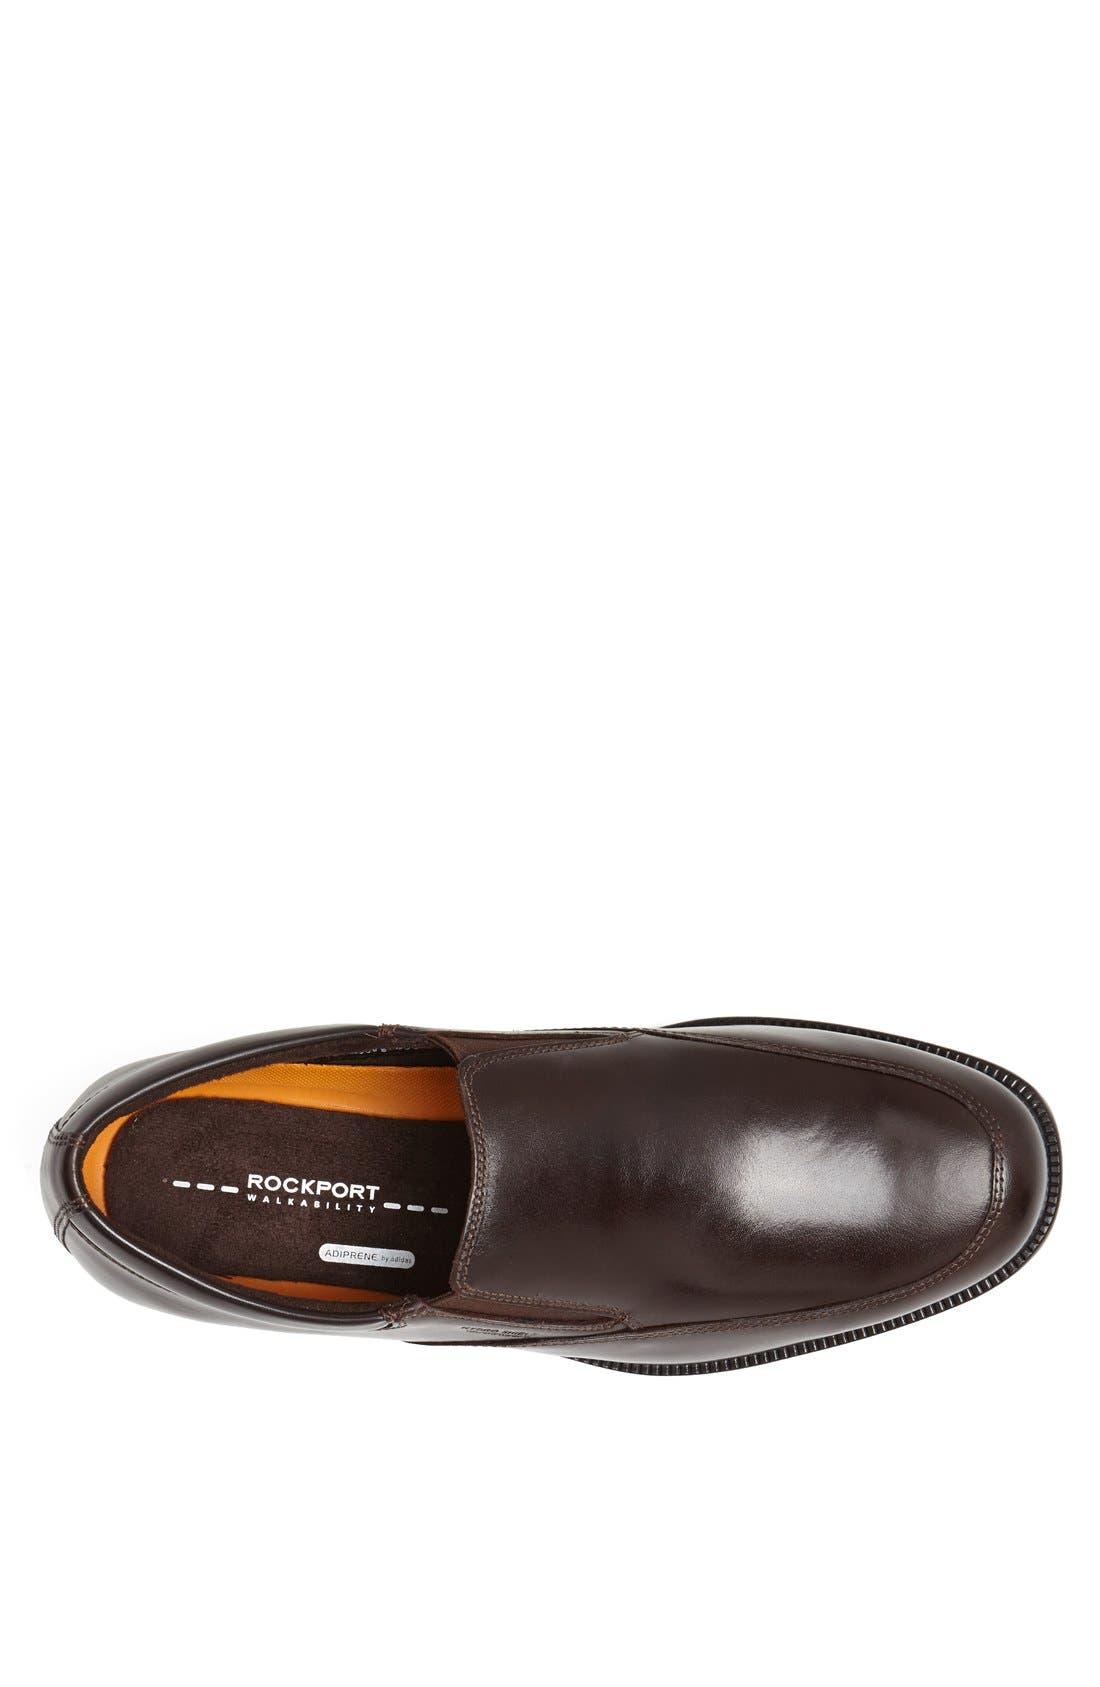 'Essential Details' Waterproof Loafer,                             Alternate thumbnail 4, color,